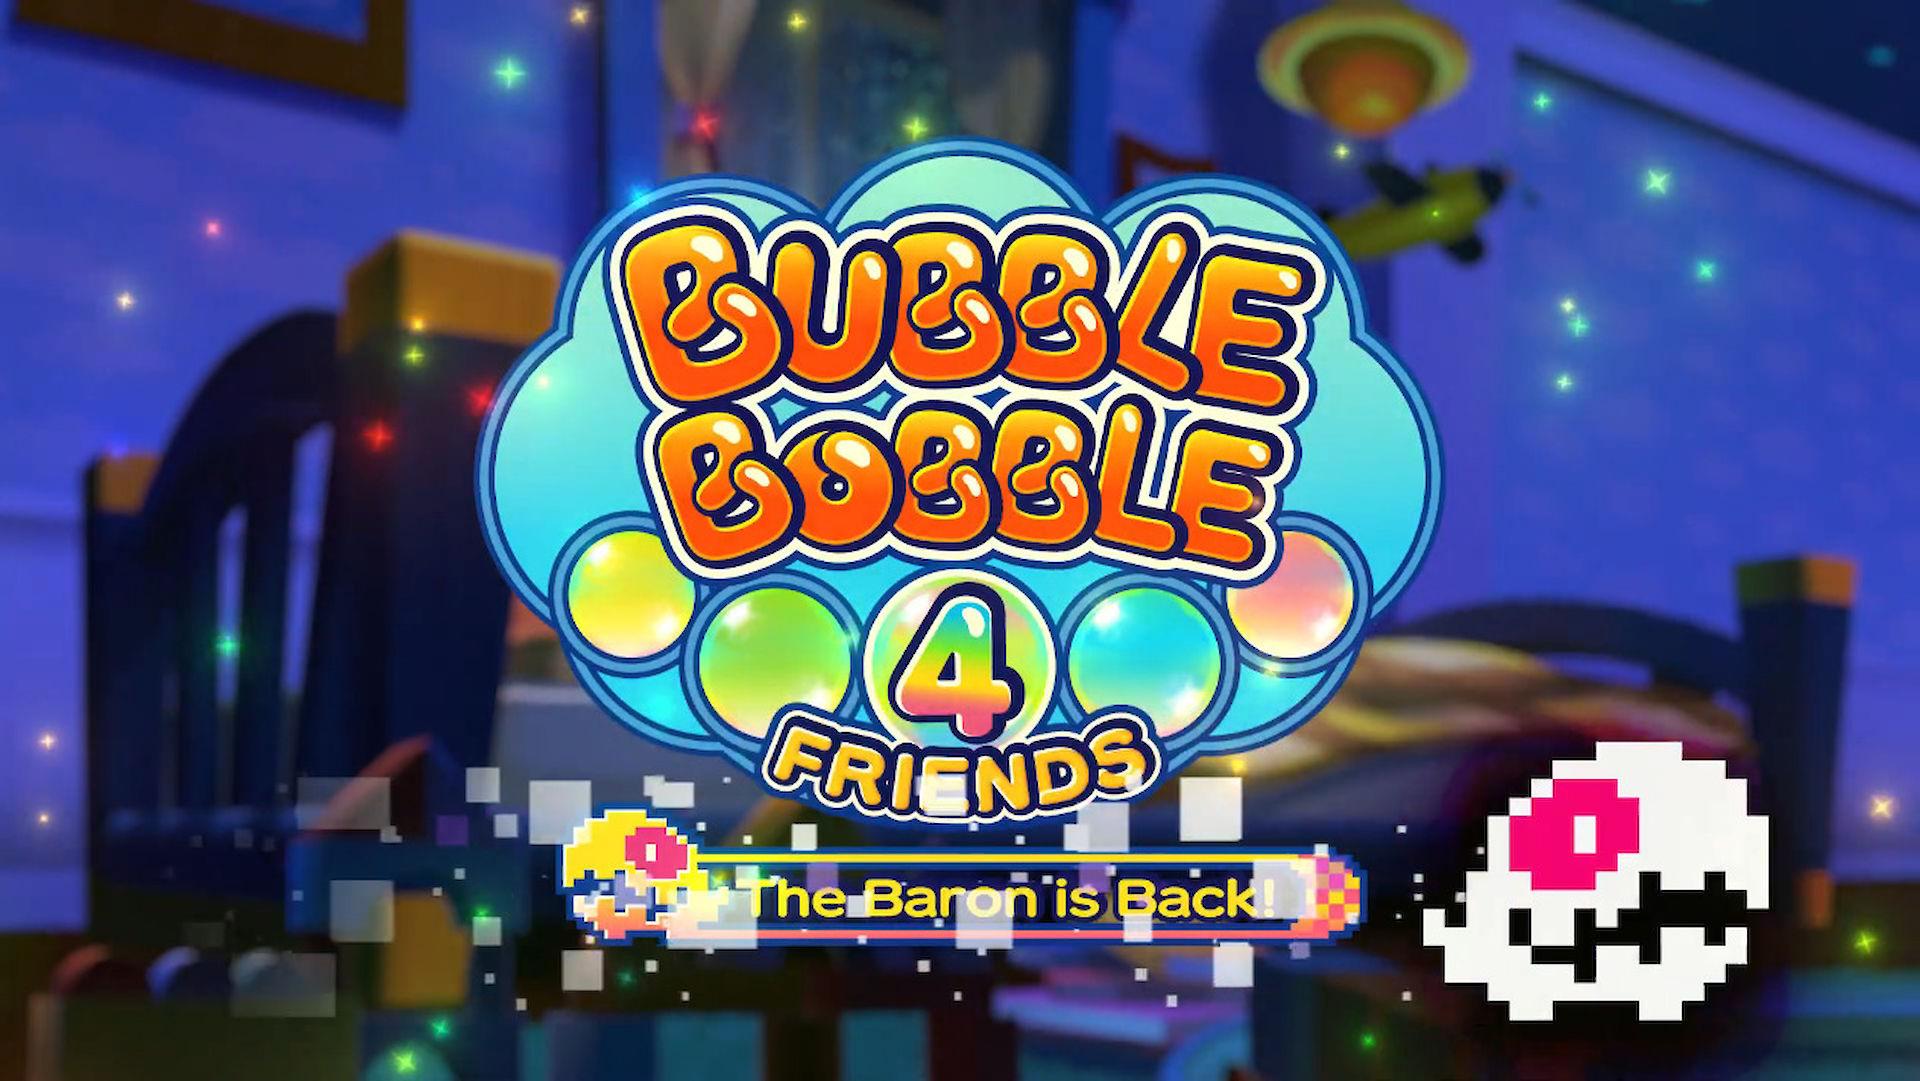 bubble_bobble_4_friends_the_baron_is_back.1920x0.jpeg